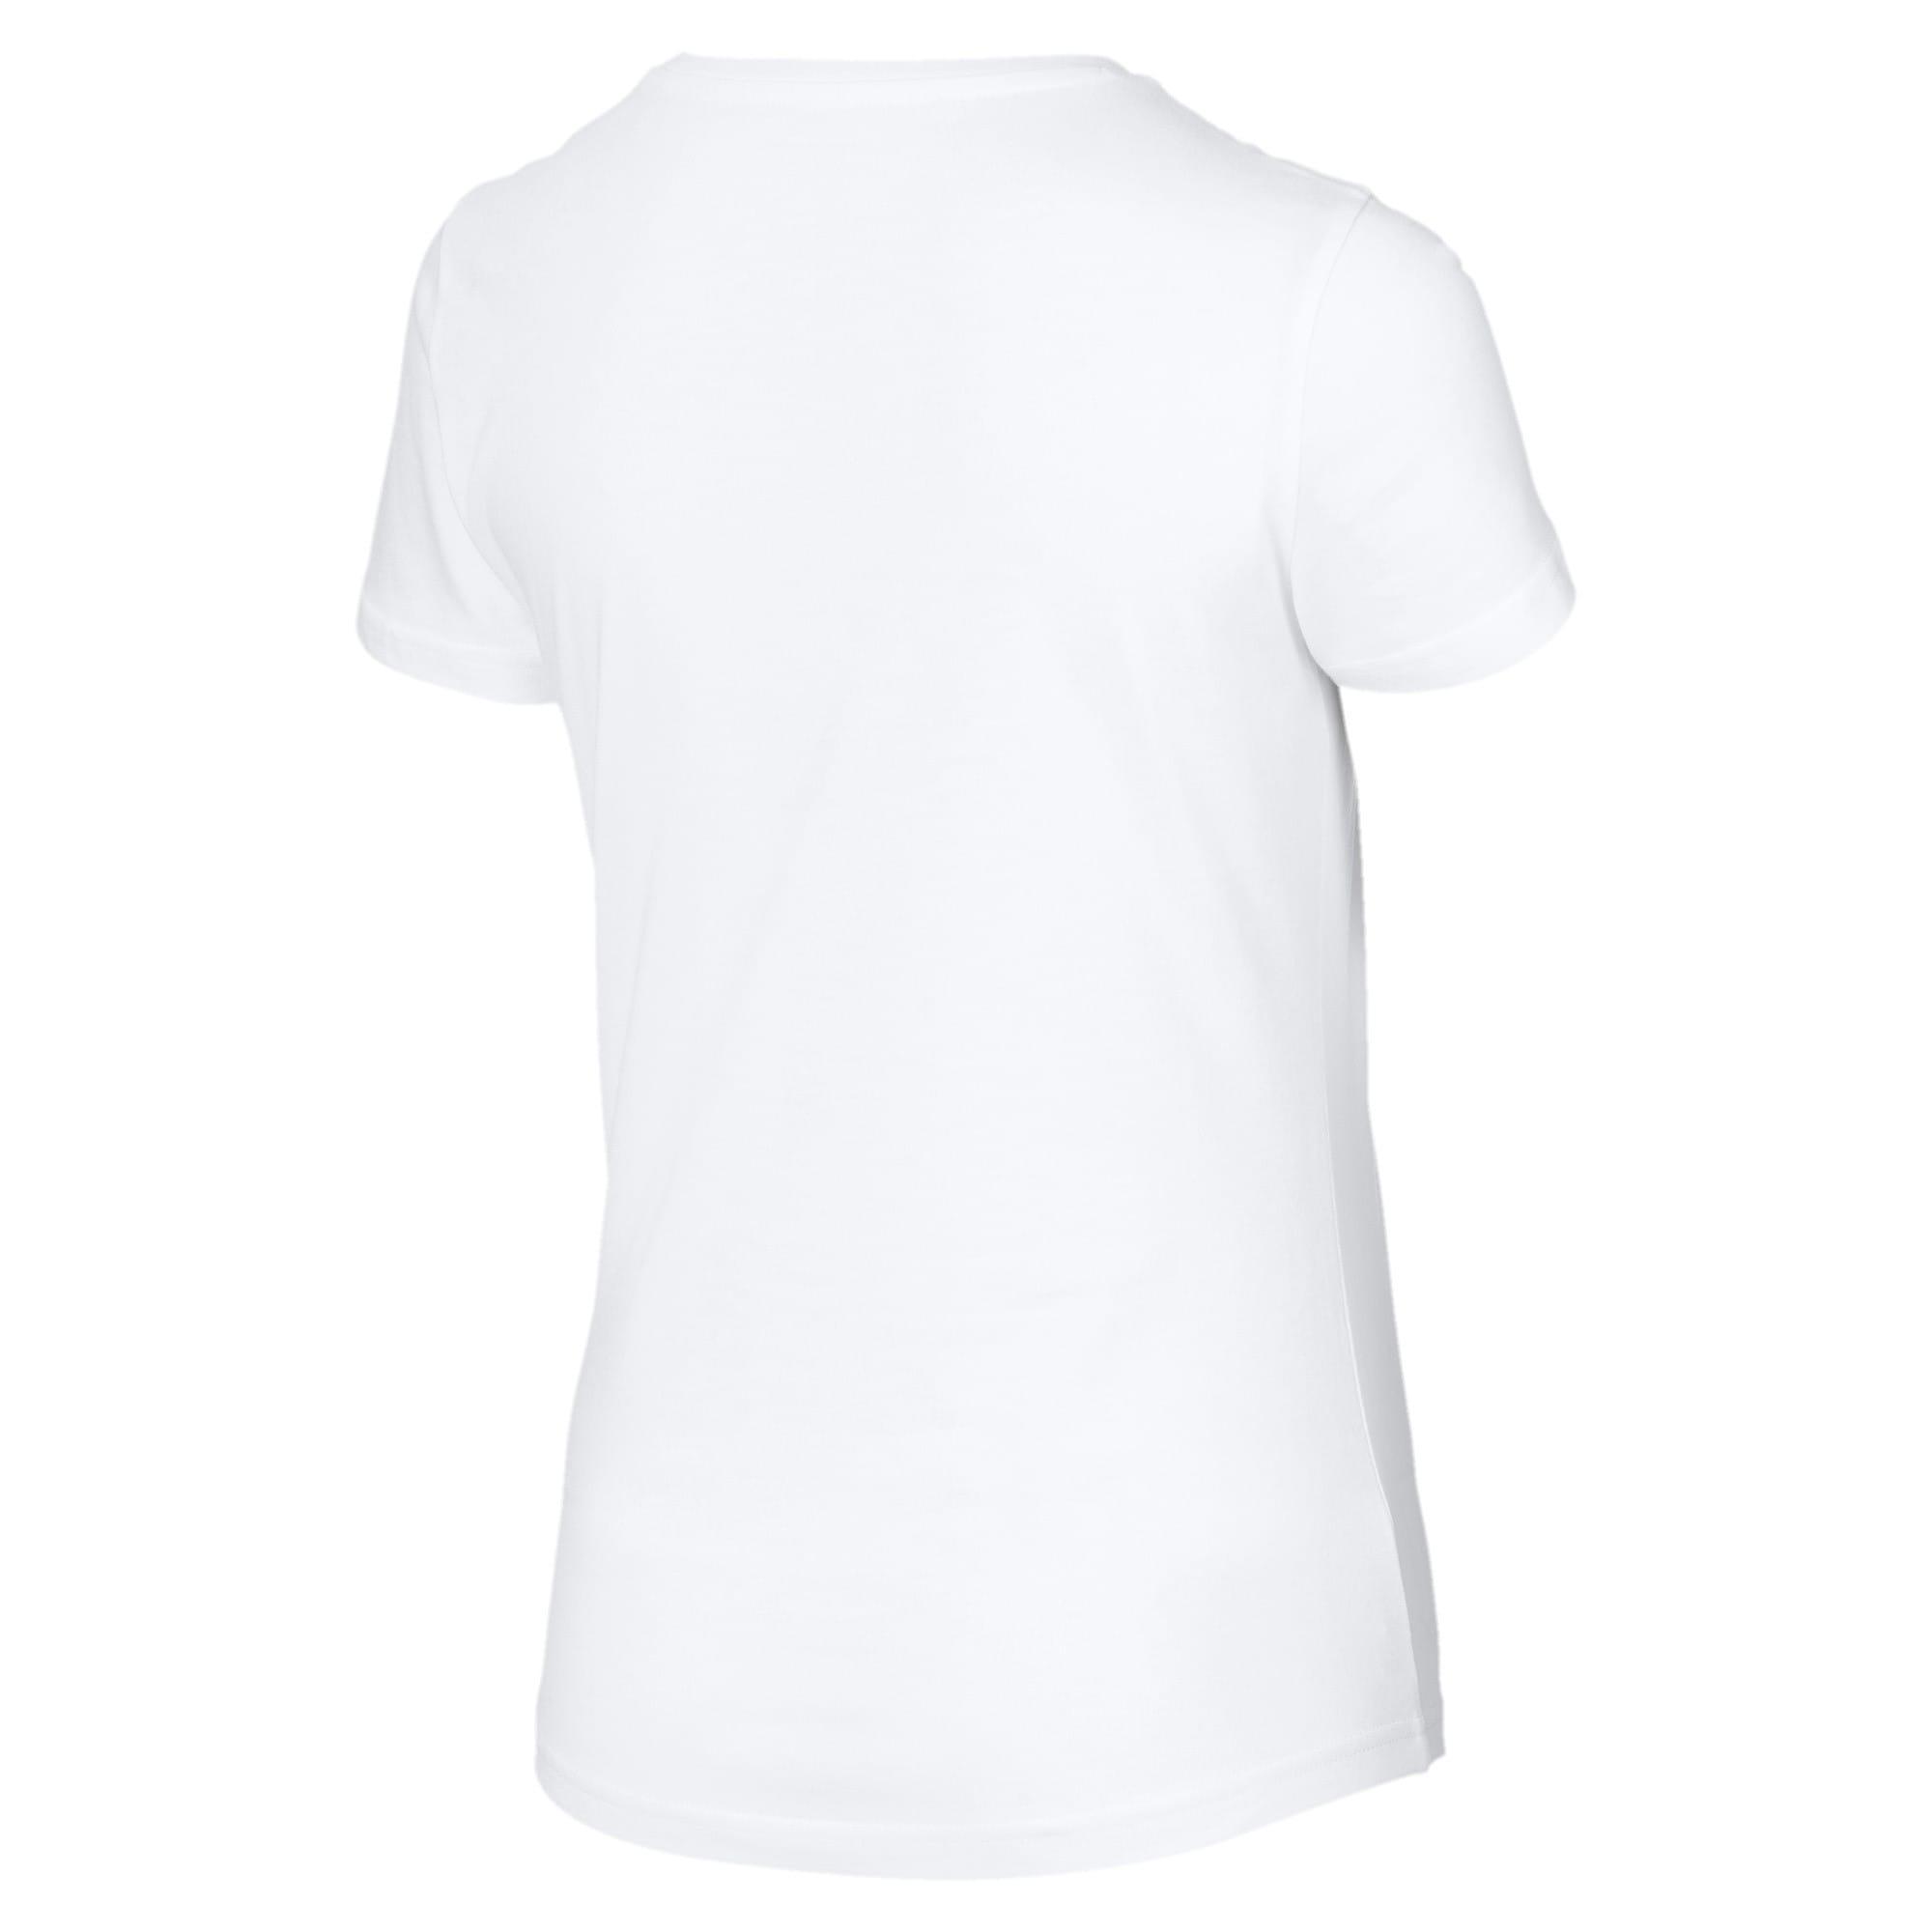 Miniatura 5 de Camiseta estampada Photoprint para mujer, Puma White, mediano